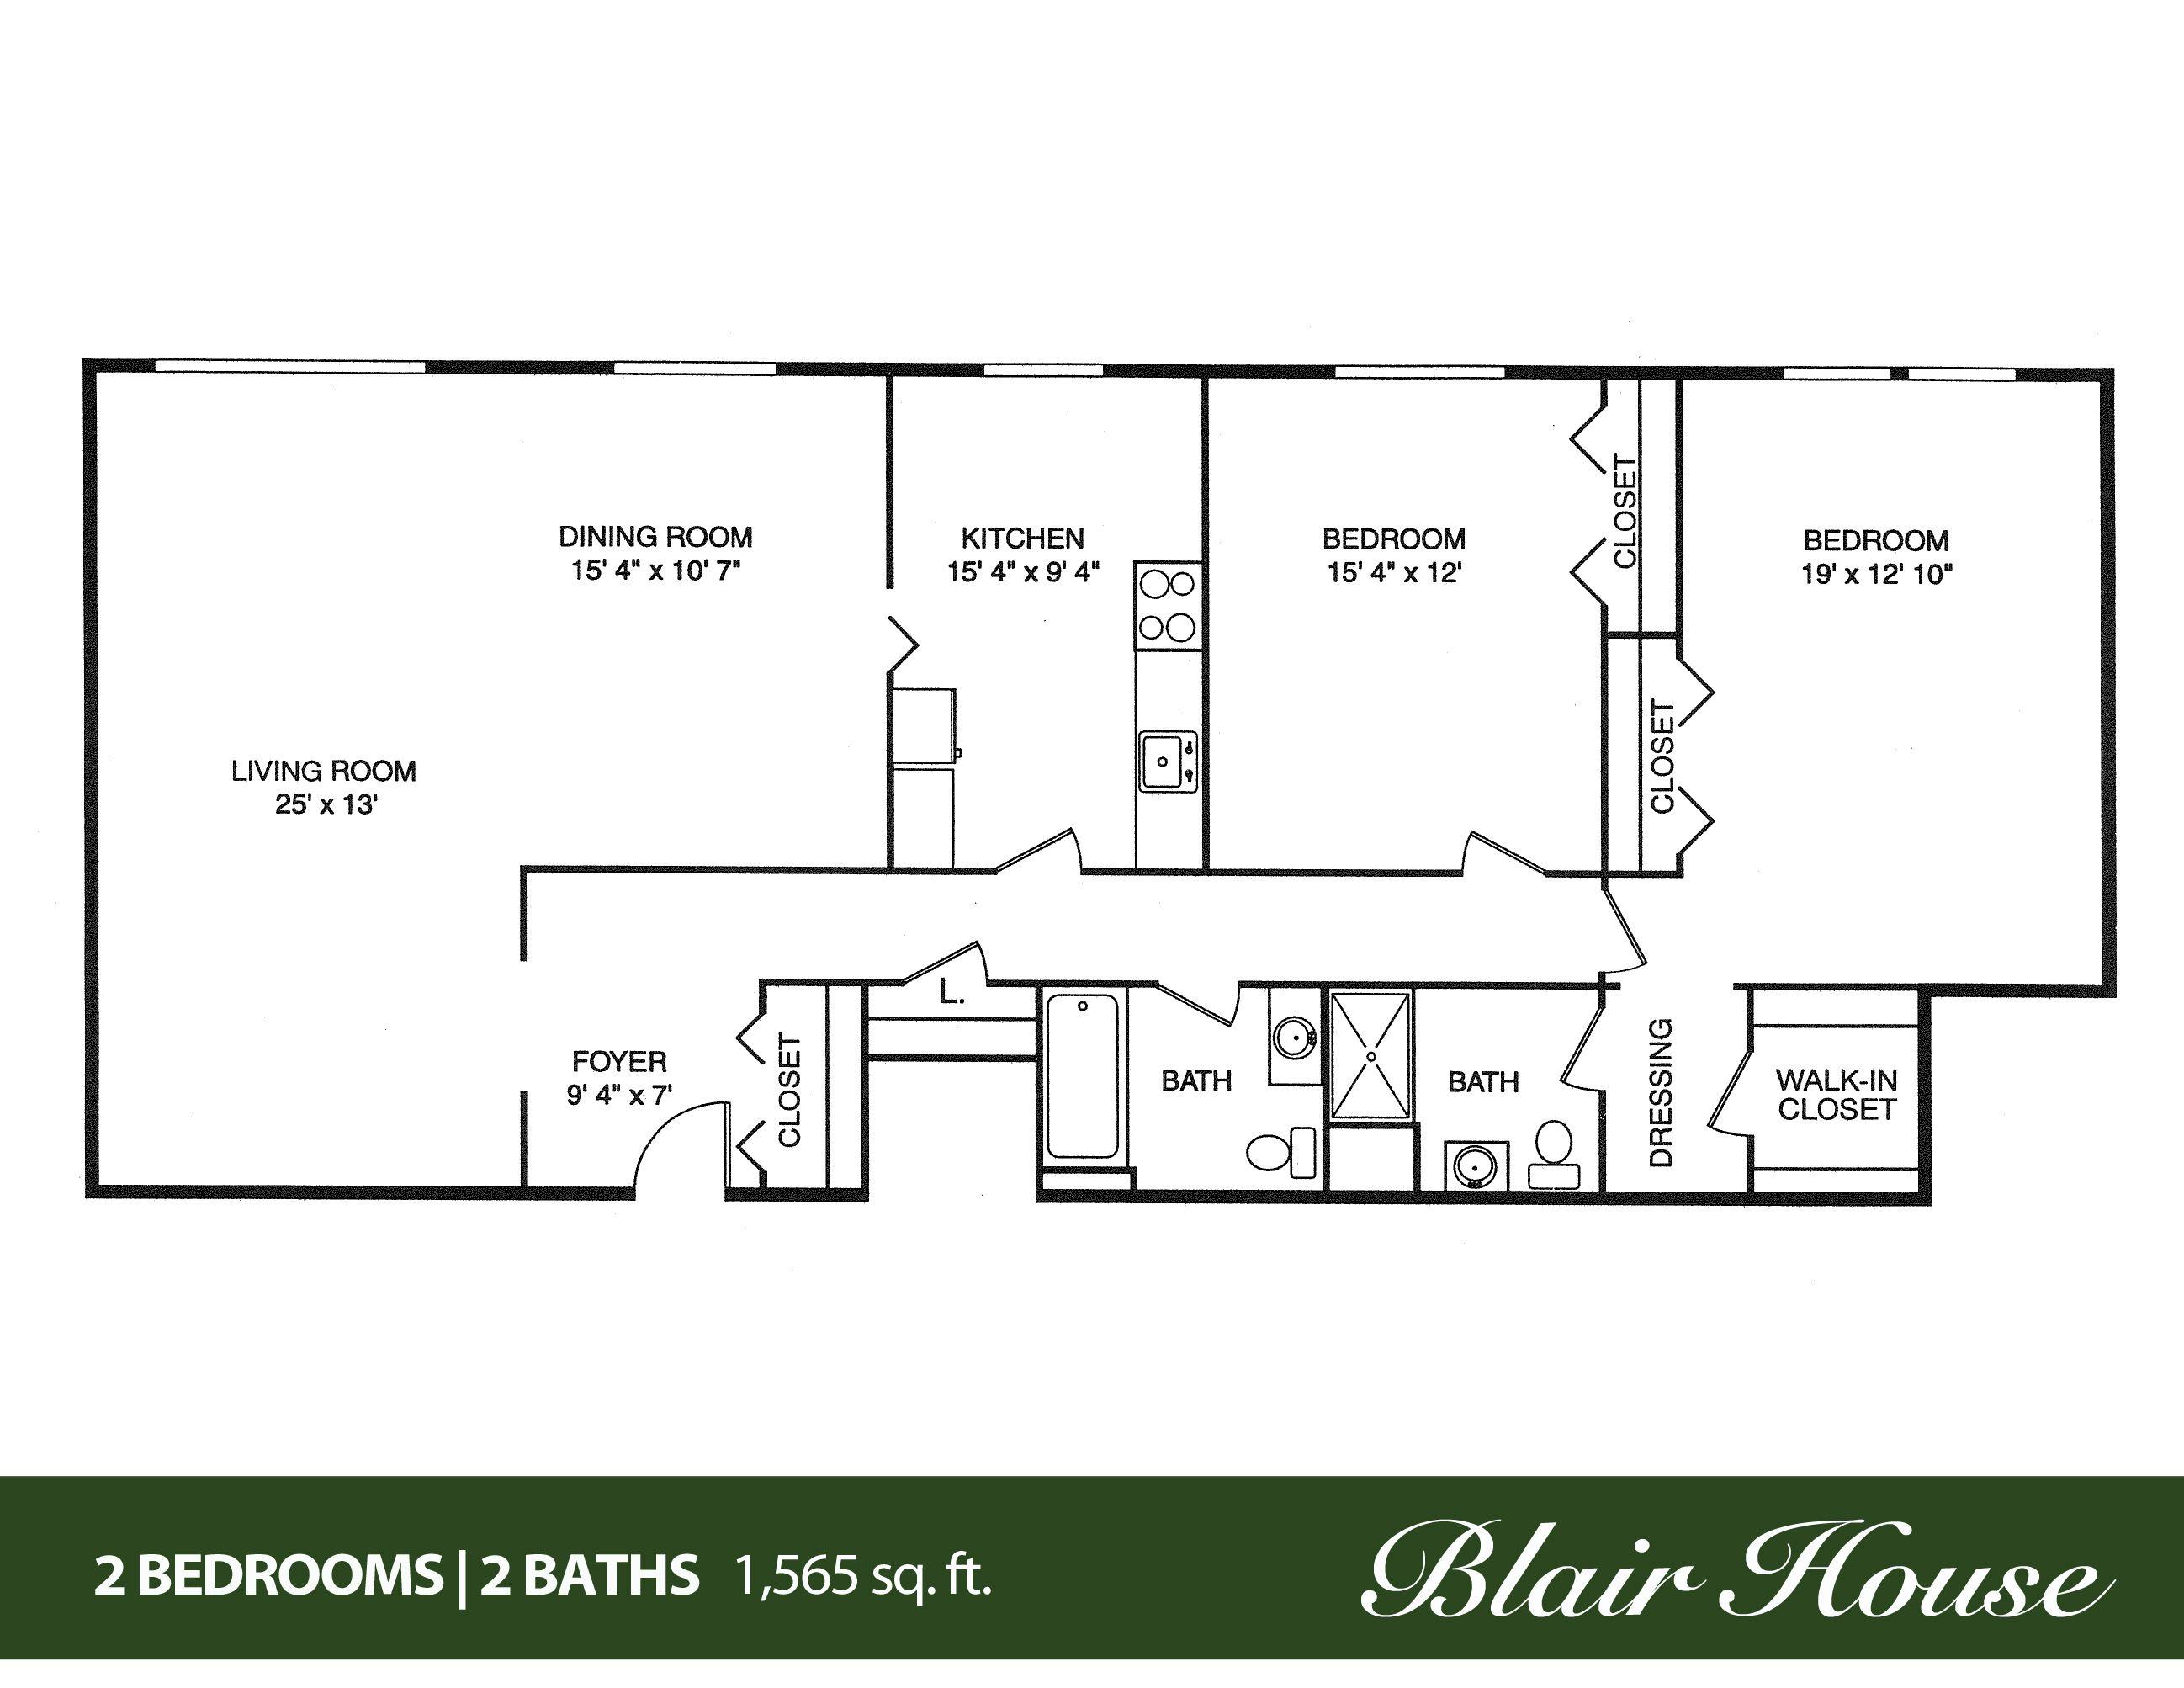 4 Bedroom 2 Bath House Plans